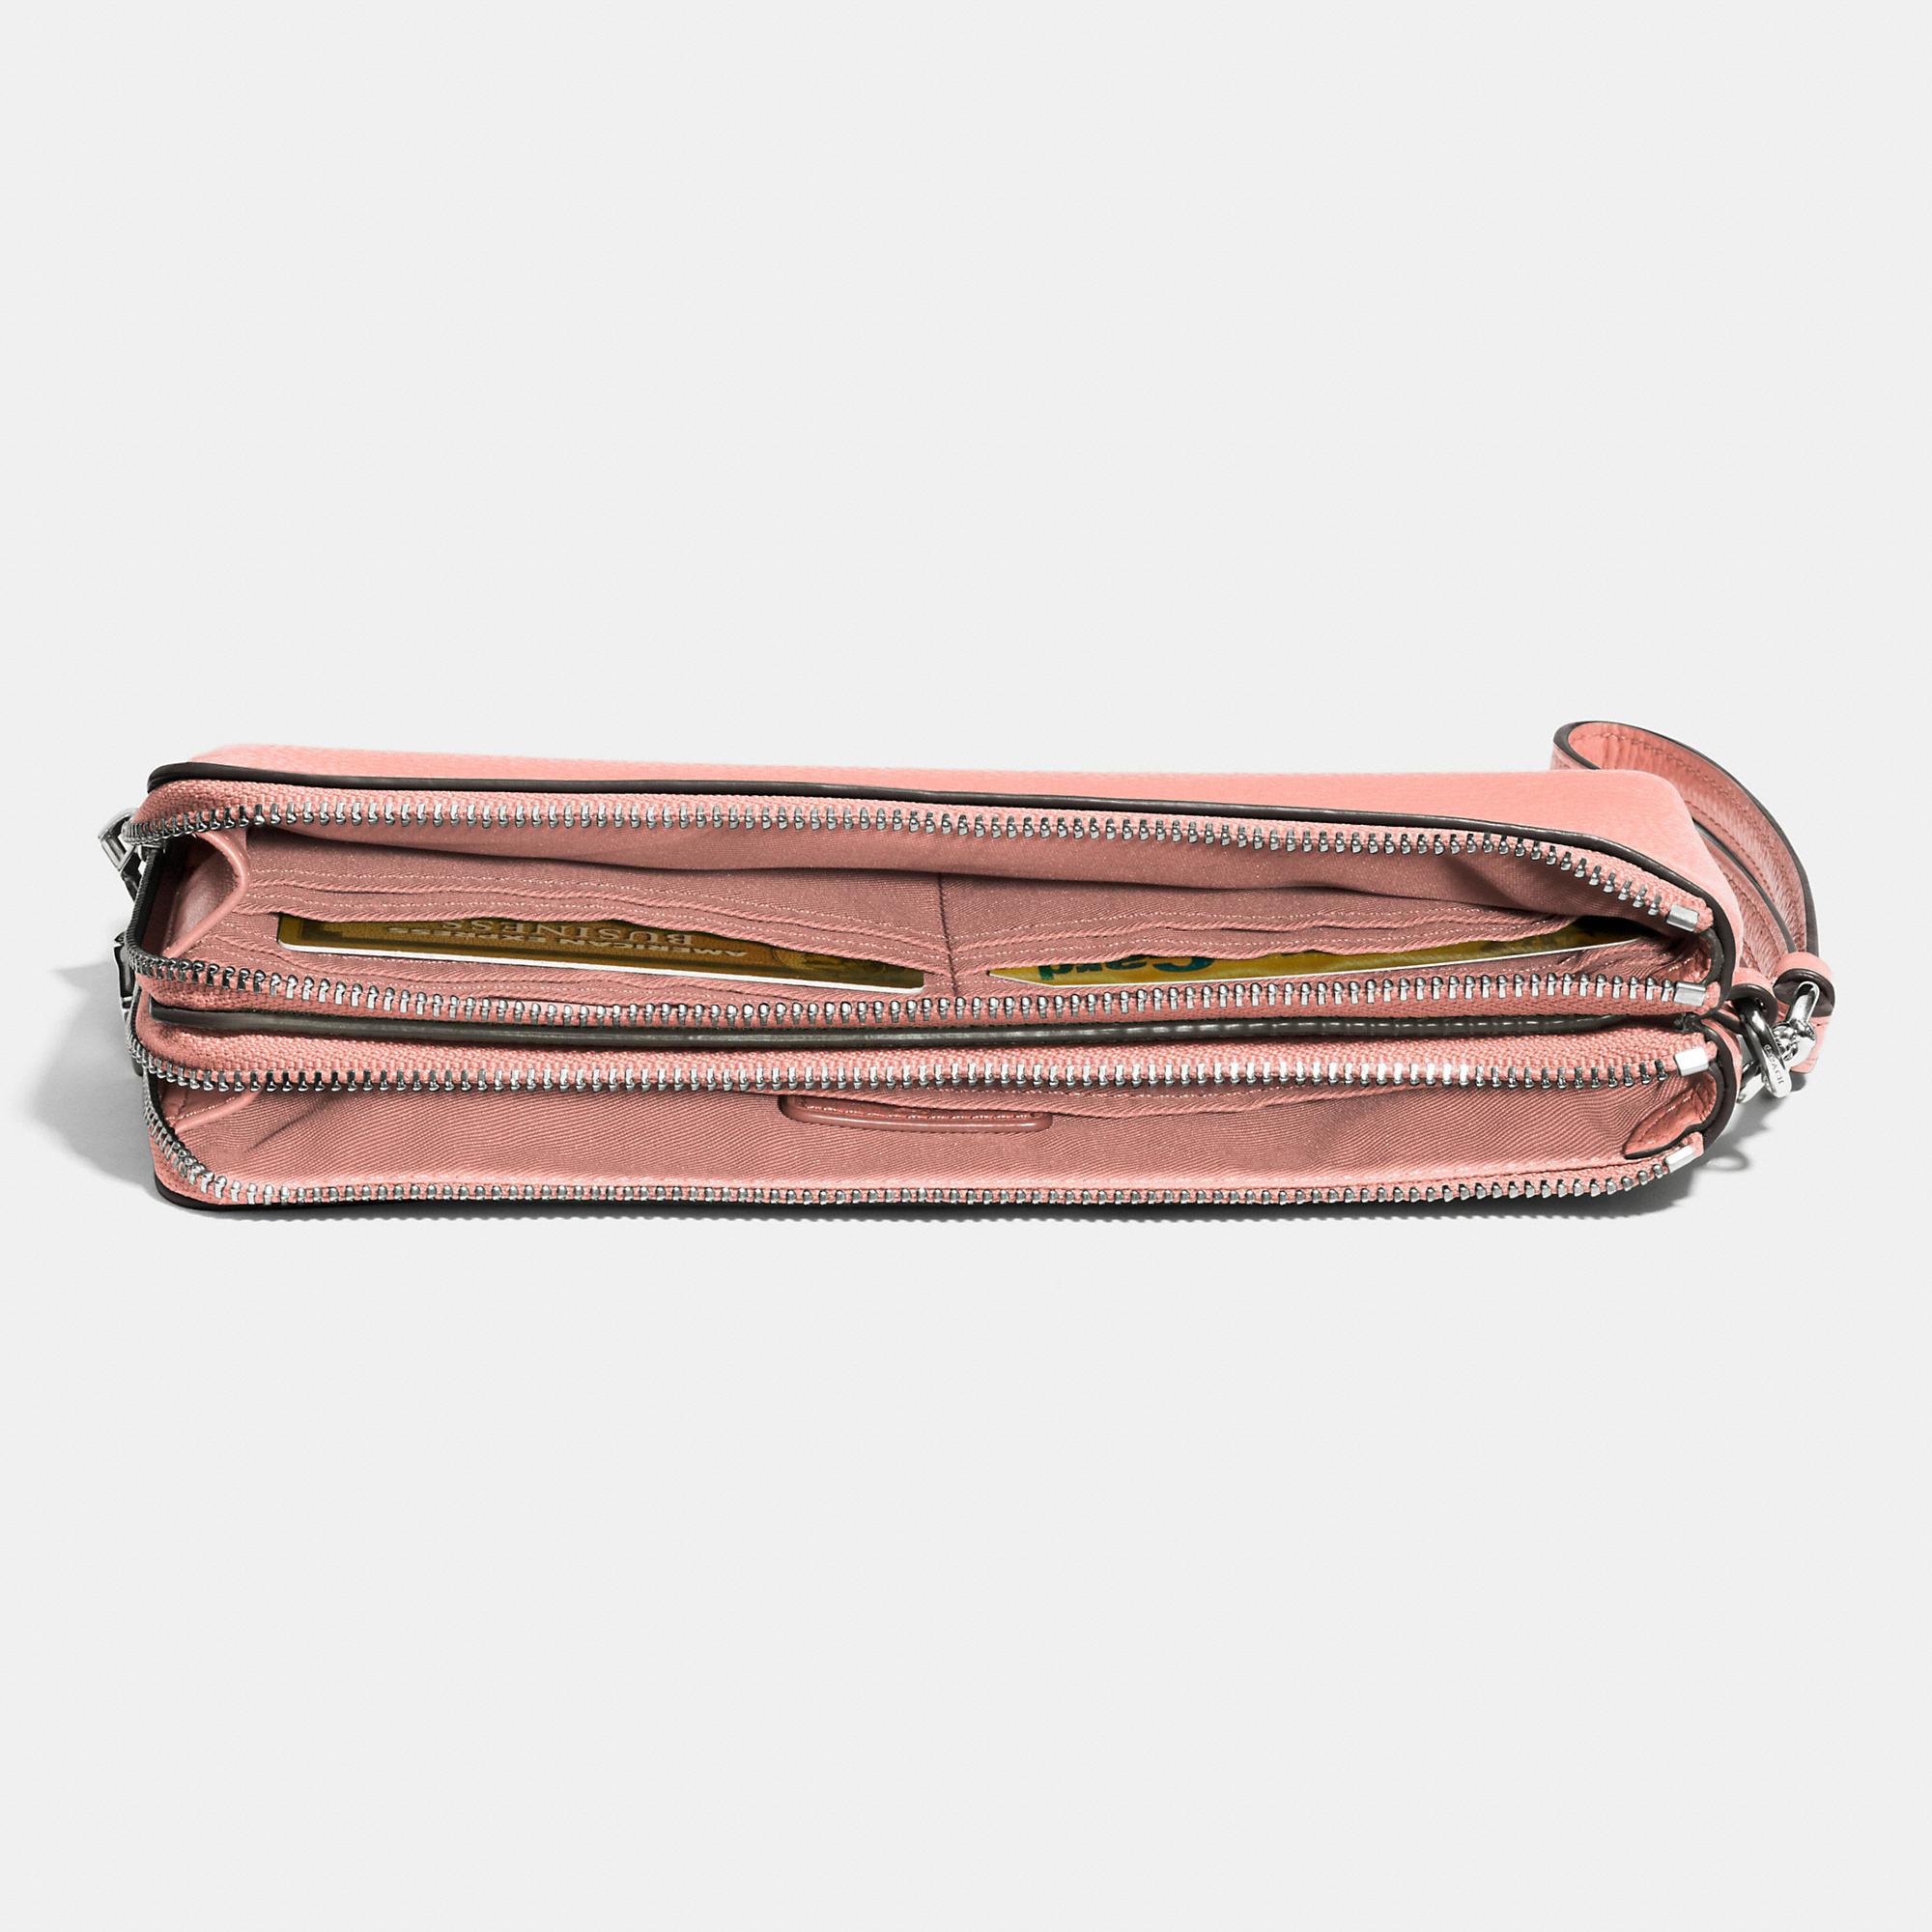 Coach Double Zip Wallet In Pebble Leather in Metallic : Lyst